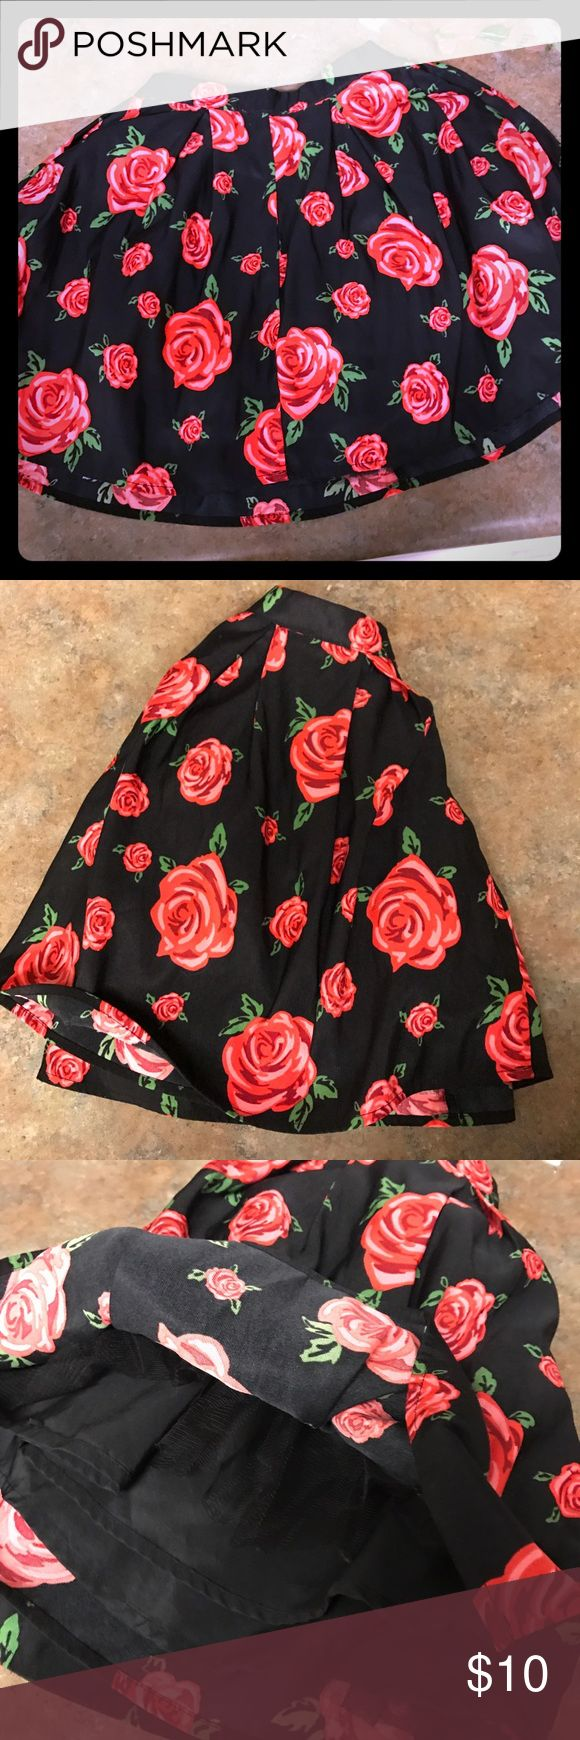 H&M Rose Black Circle Skirt Brand new circle skirt. Taken in on the waist H&M Skirts Circle & Skater